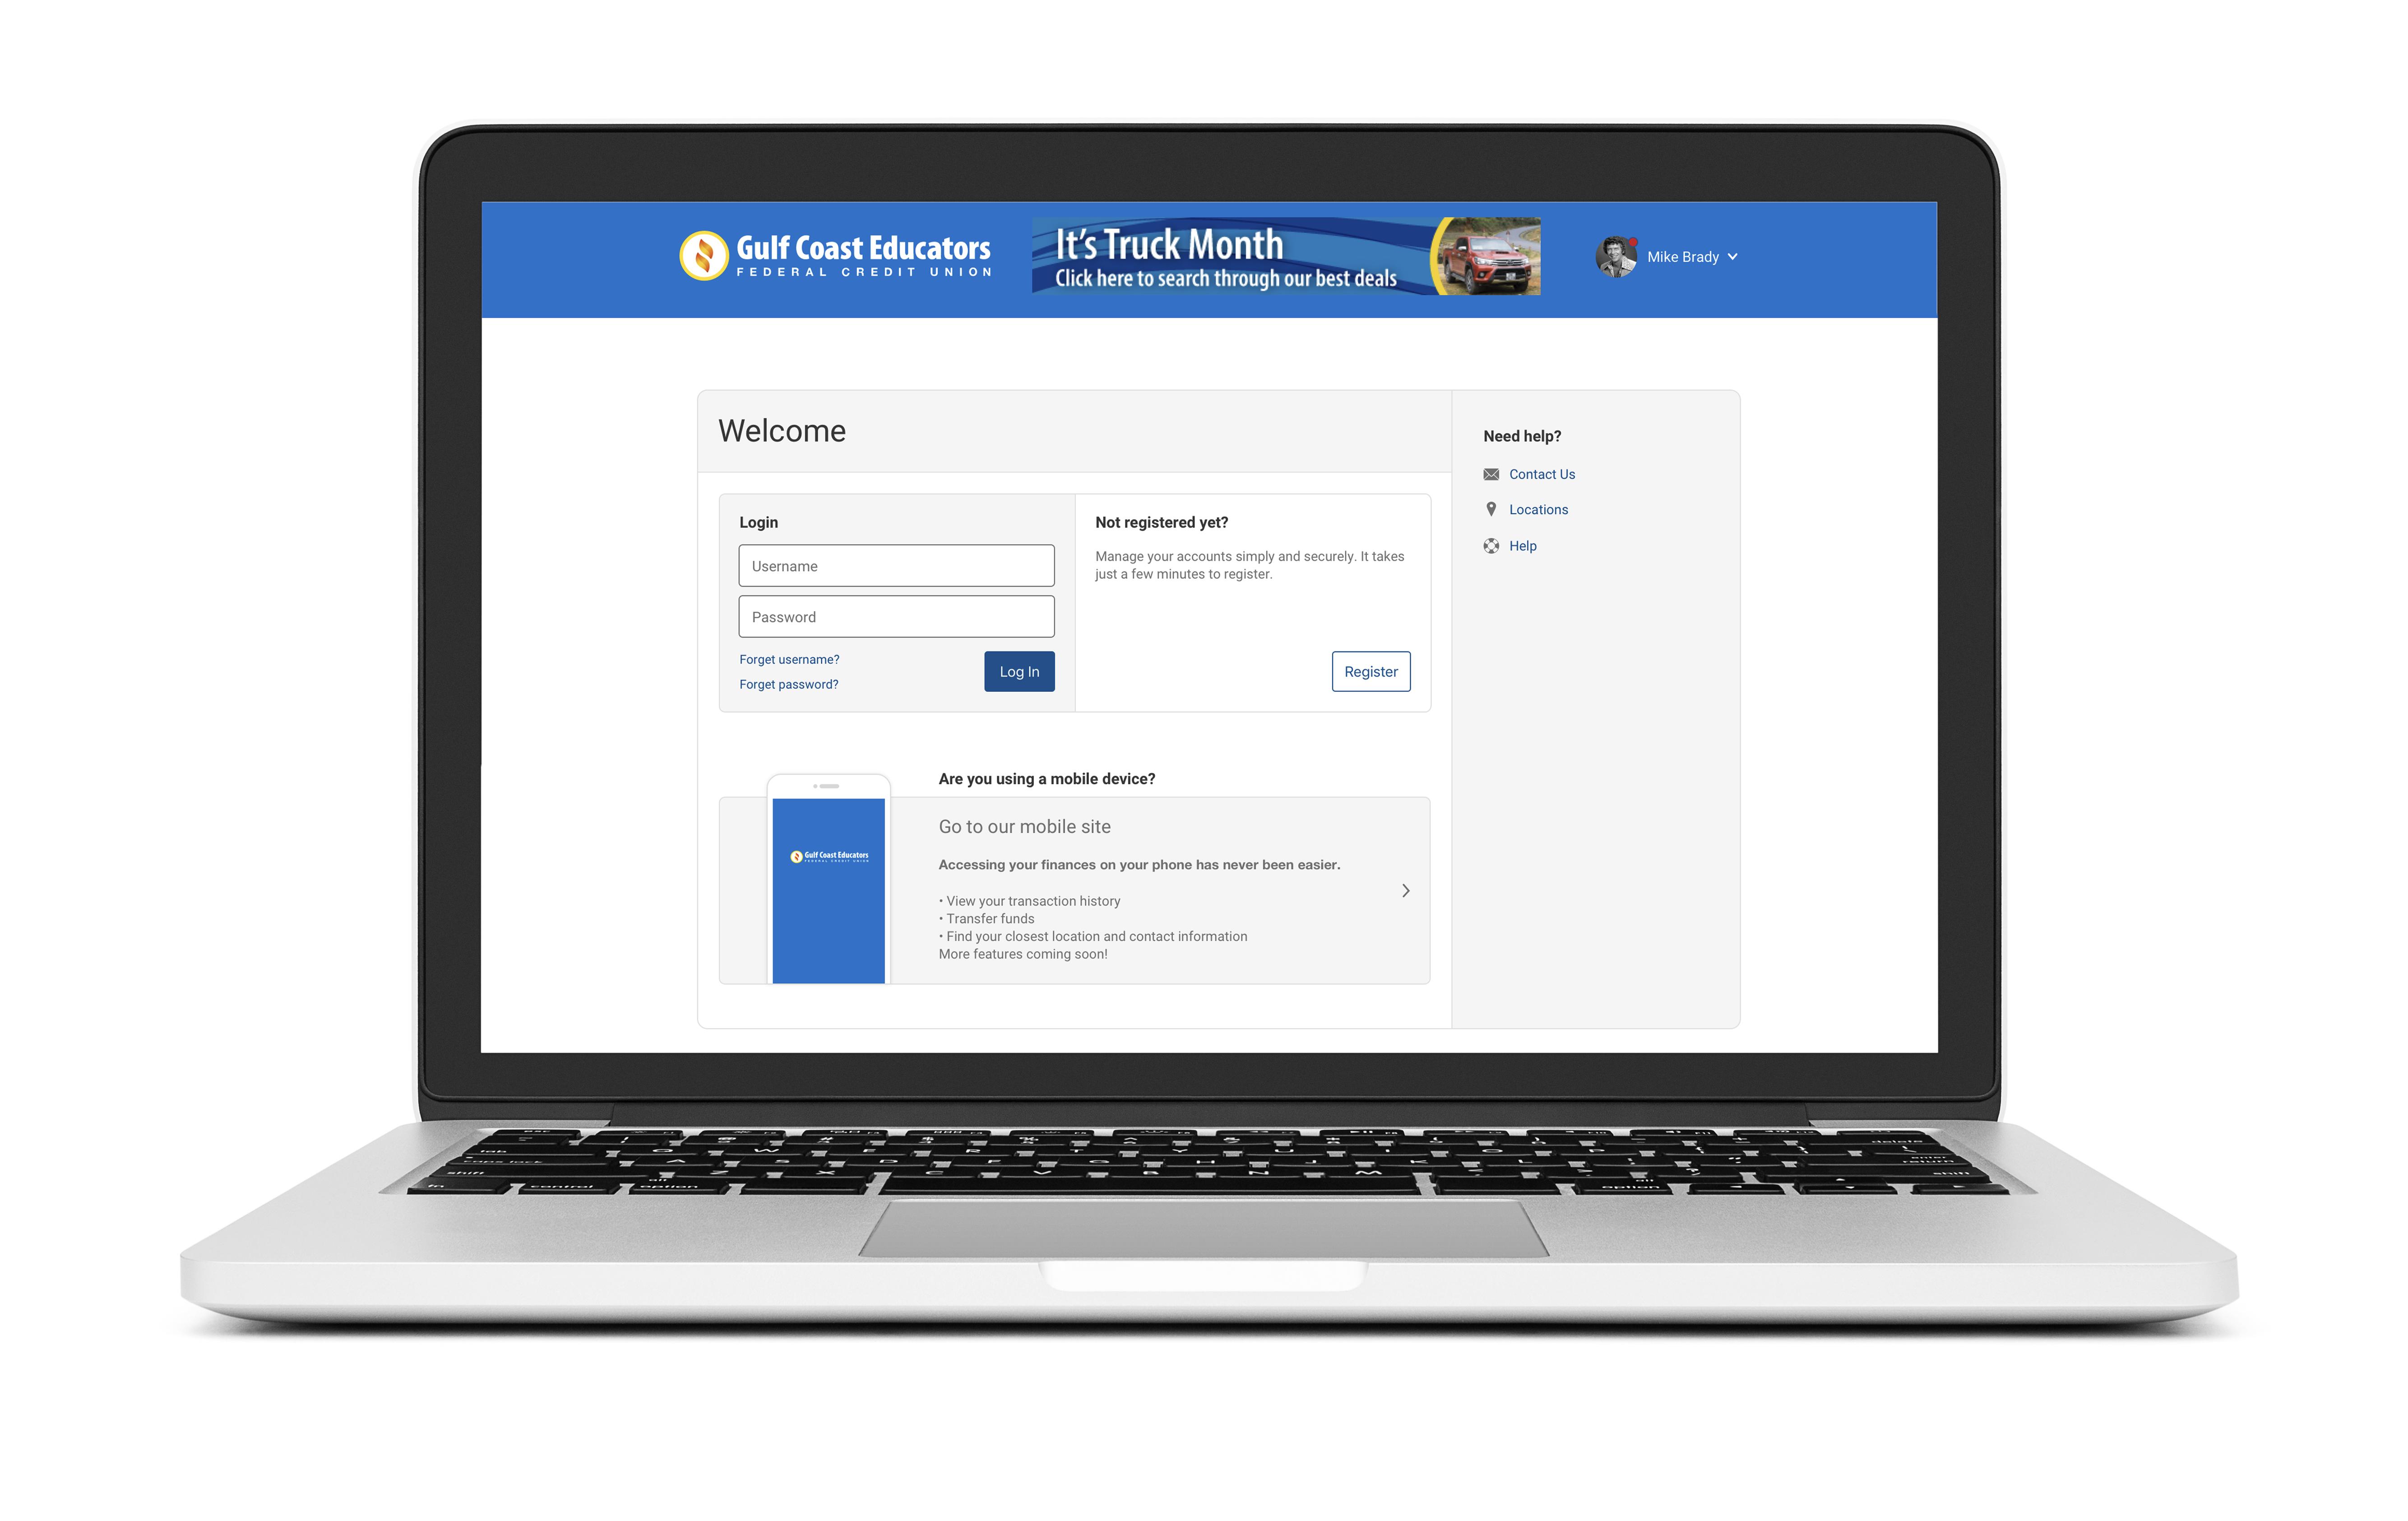 Online banking image